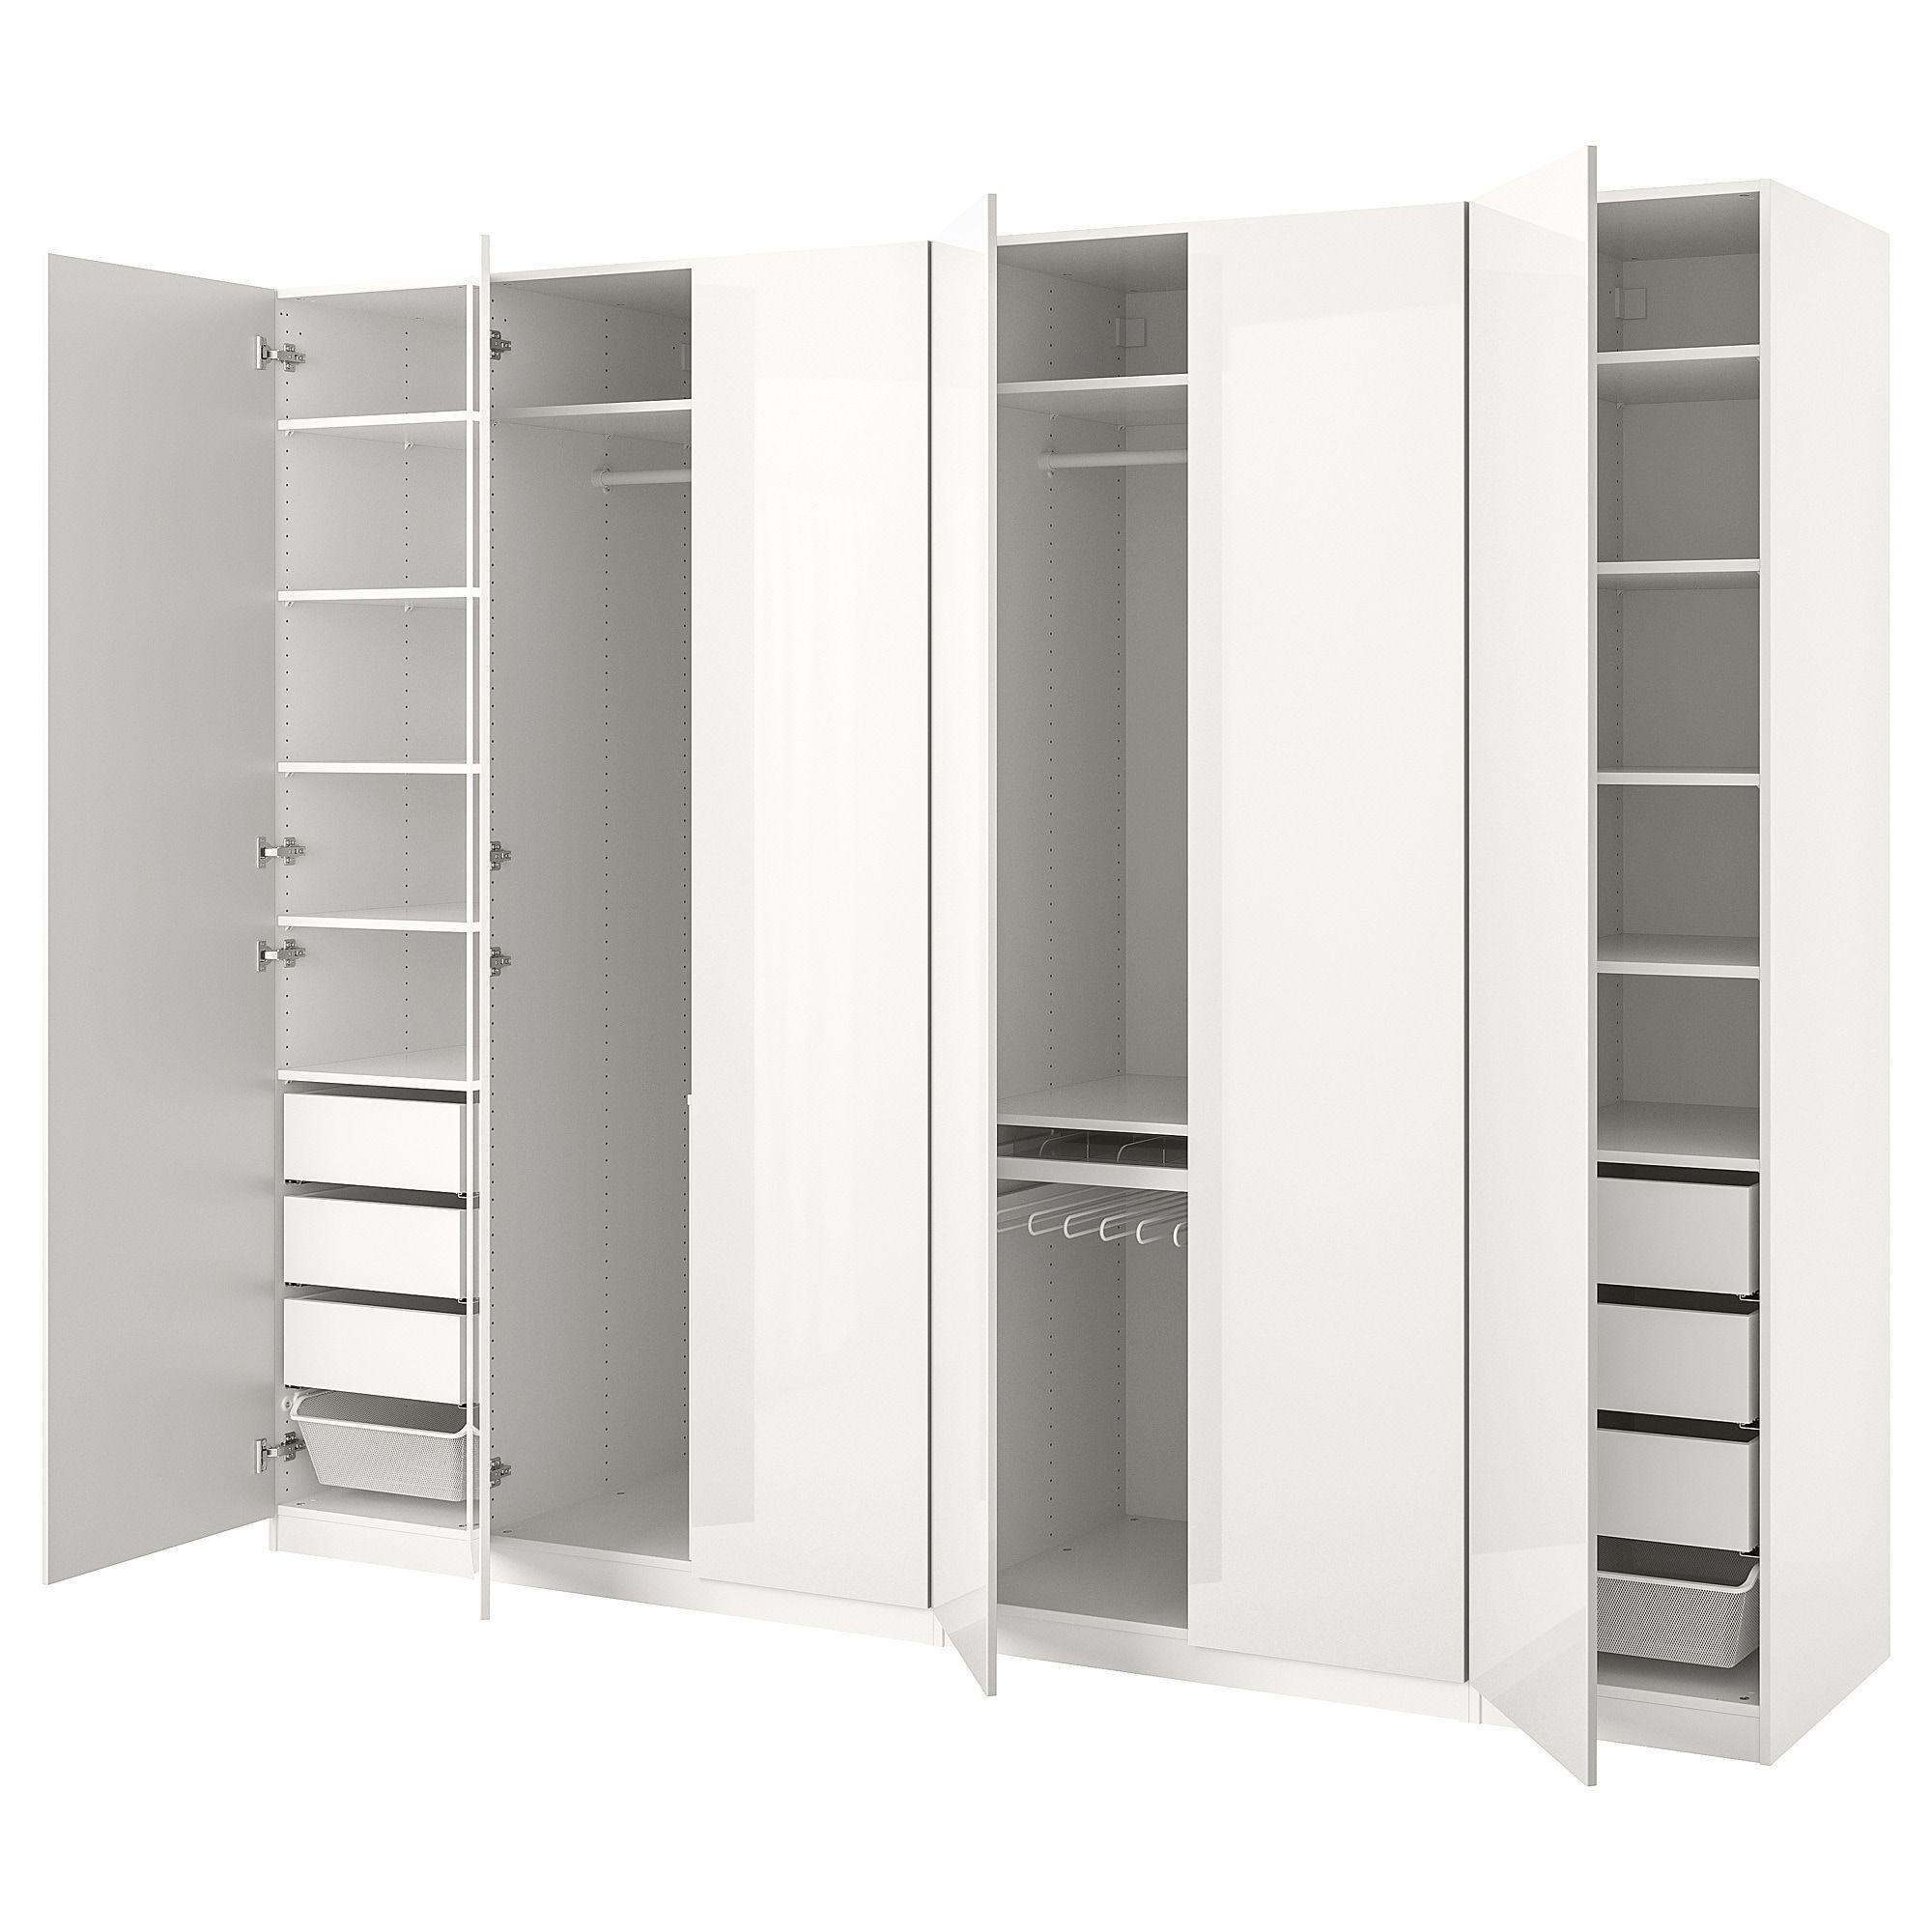 Wardrobe, white, Fardal highgloss/white, 118 1/8x23 5